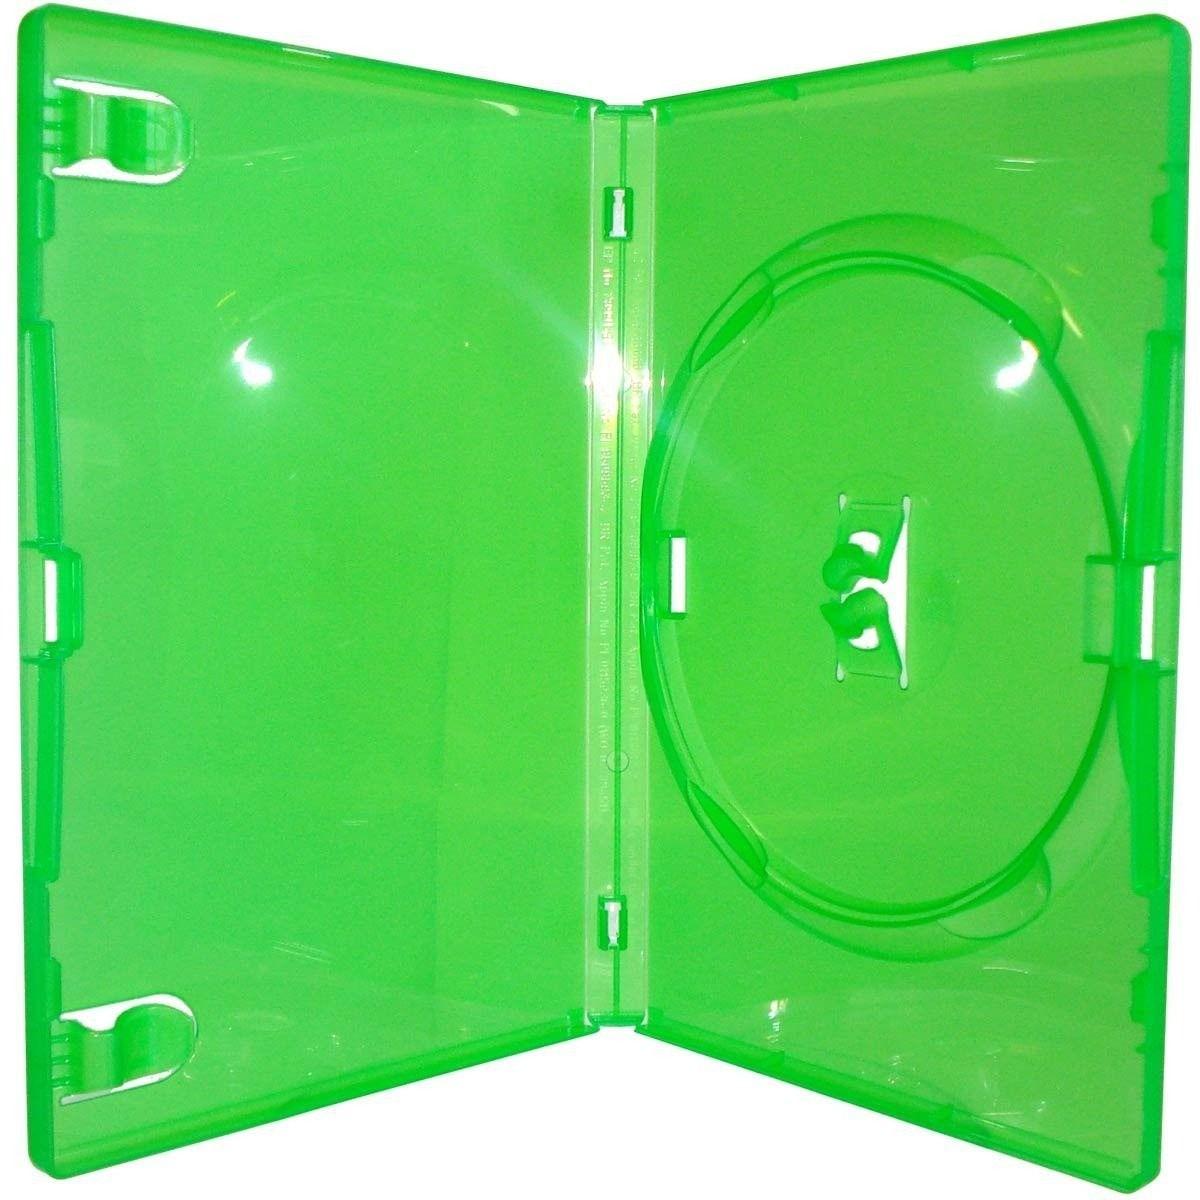 BOX DVD AMARAY VERDE SONY